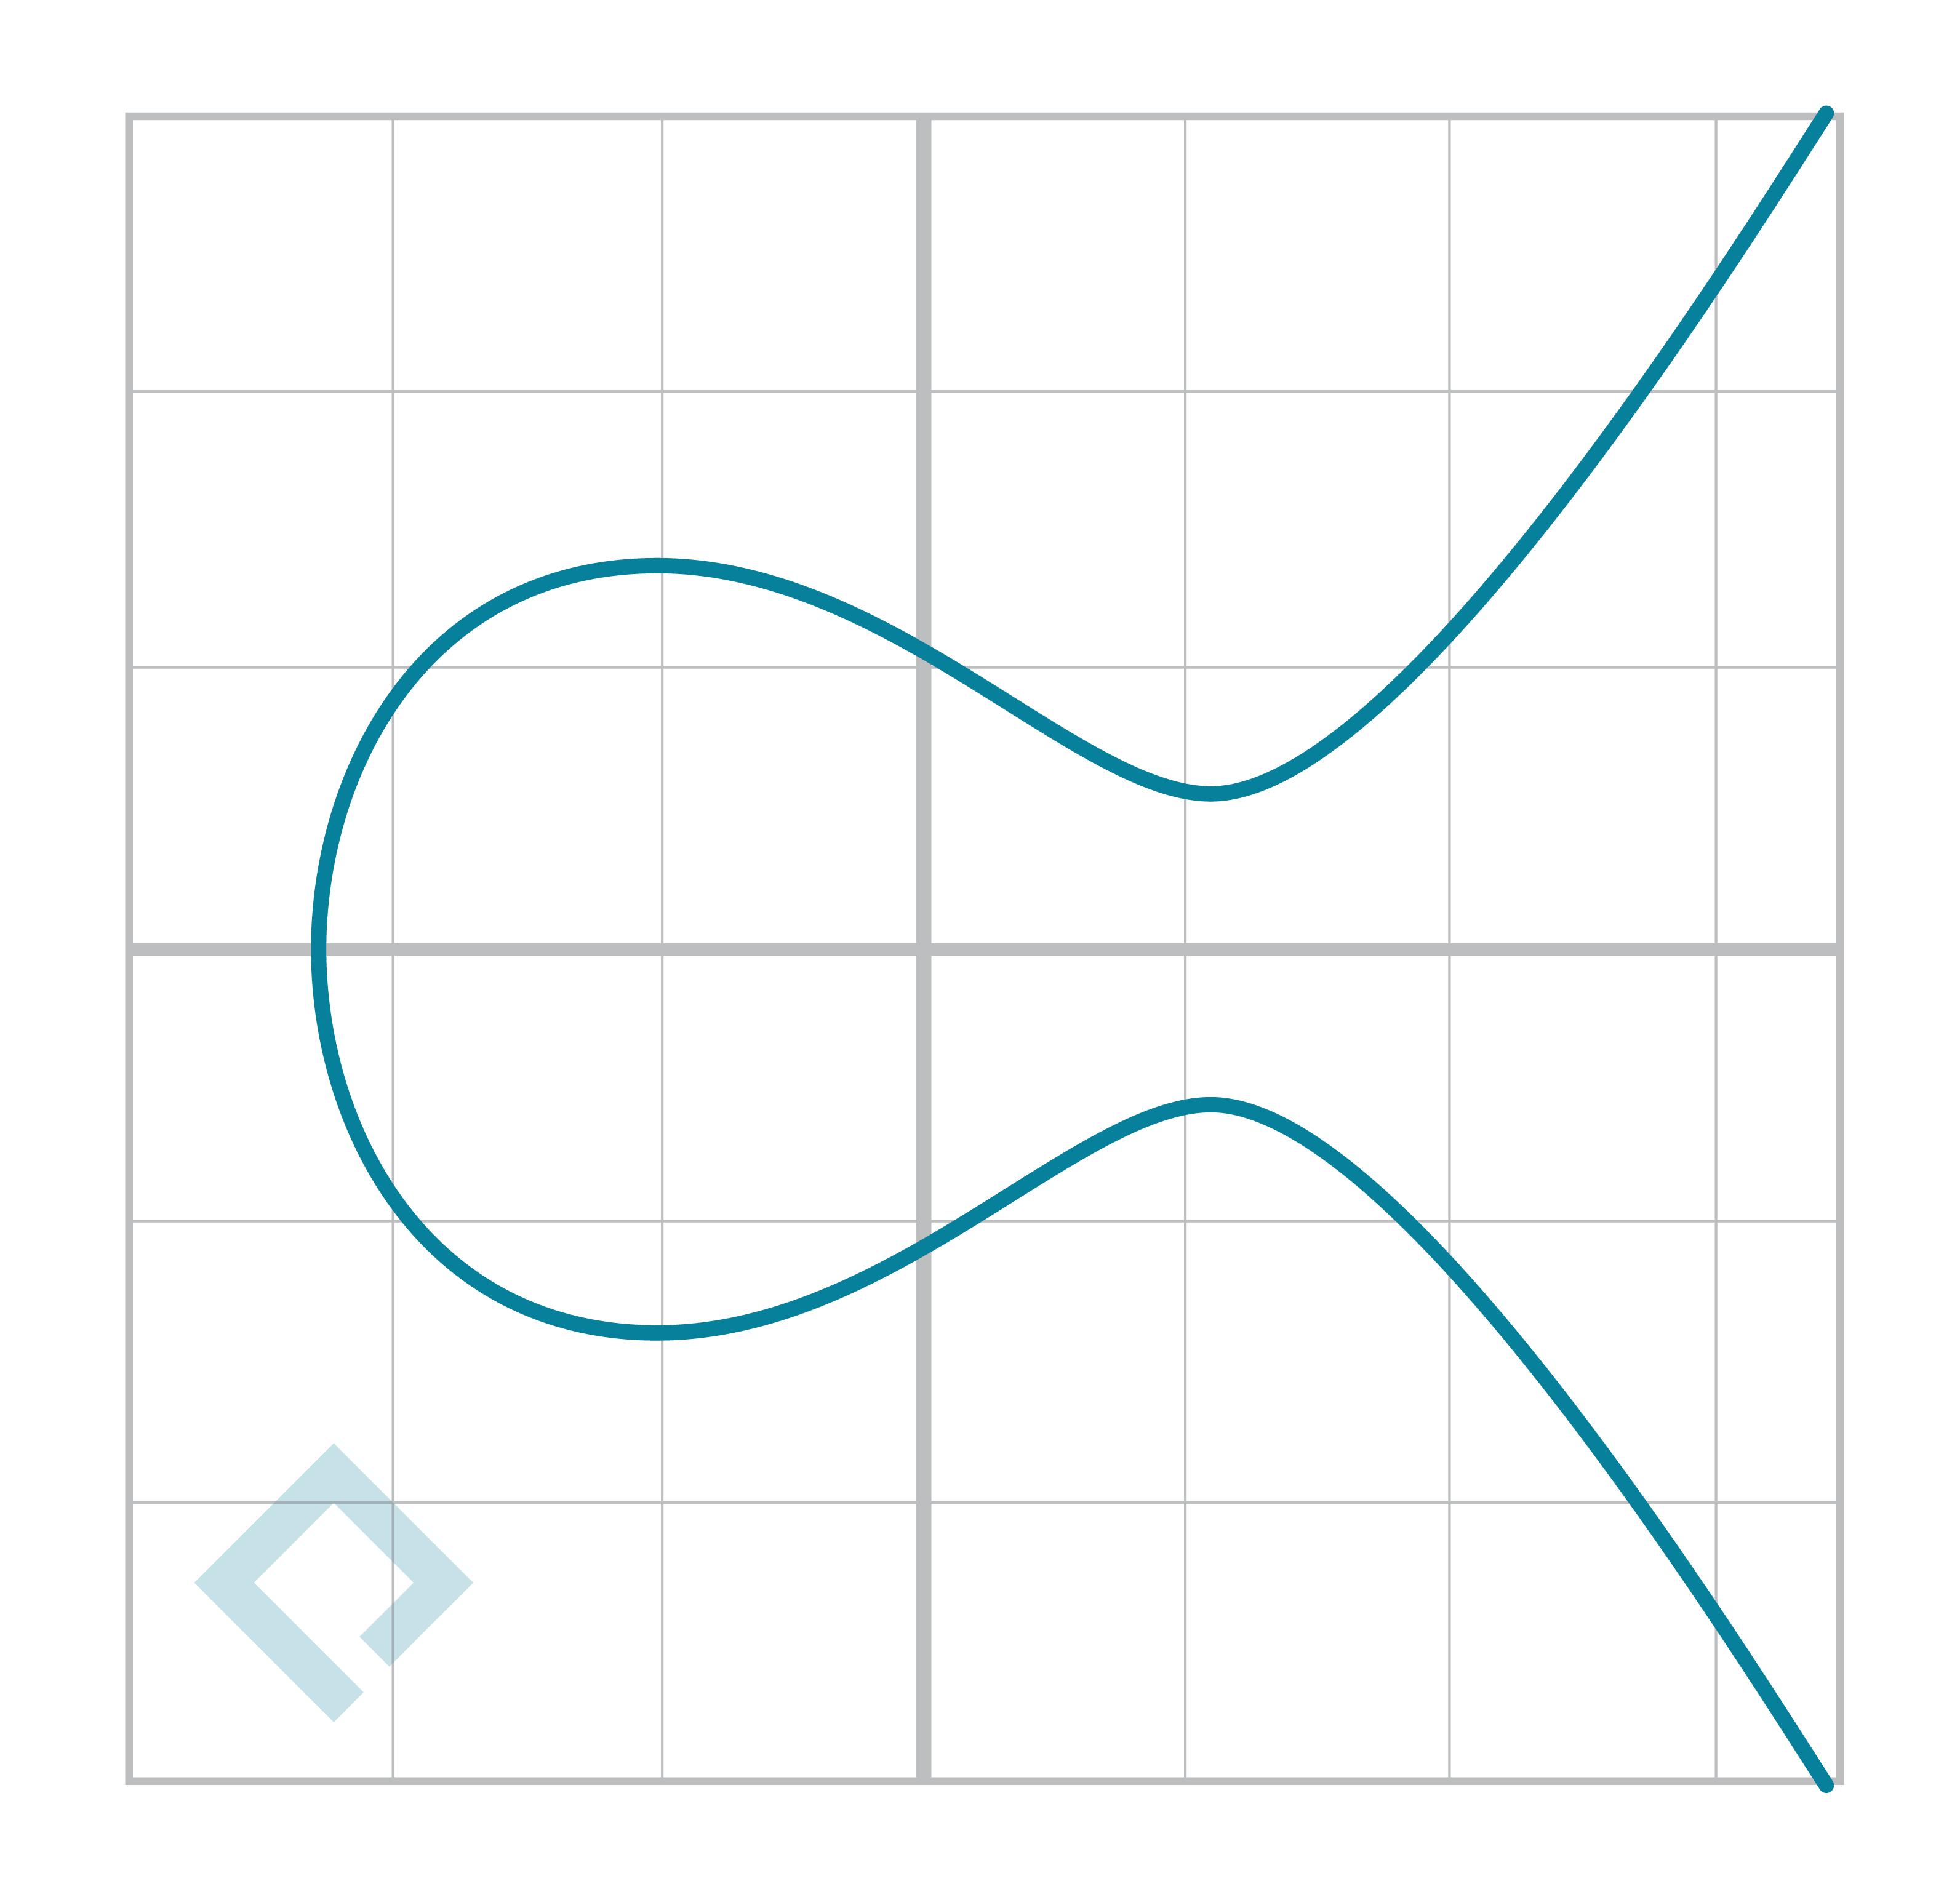 Blockchain101-graphs-05.png